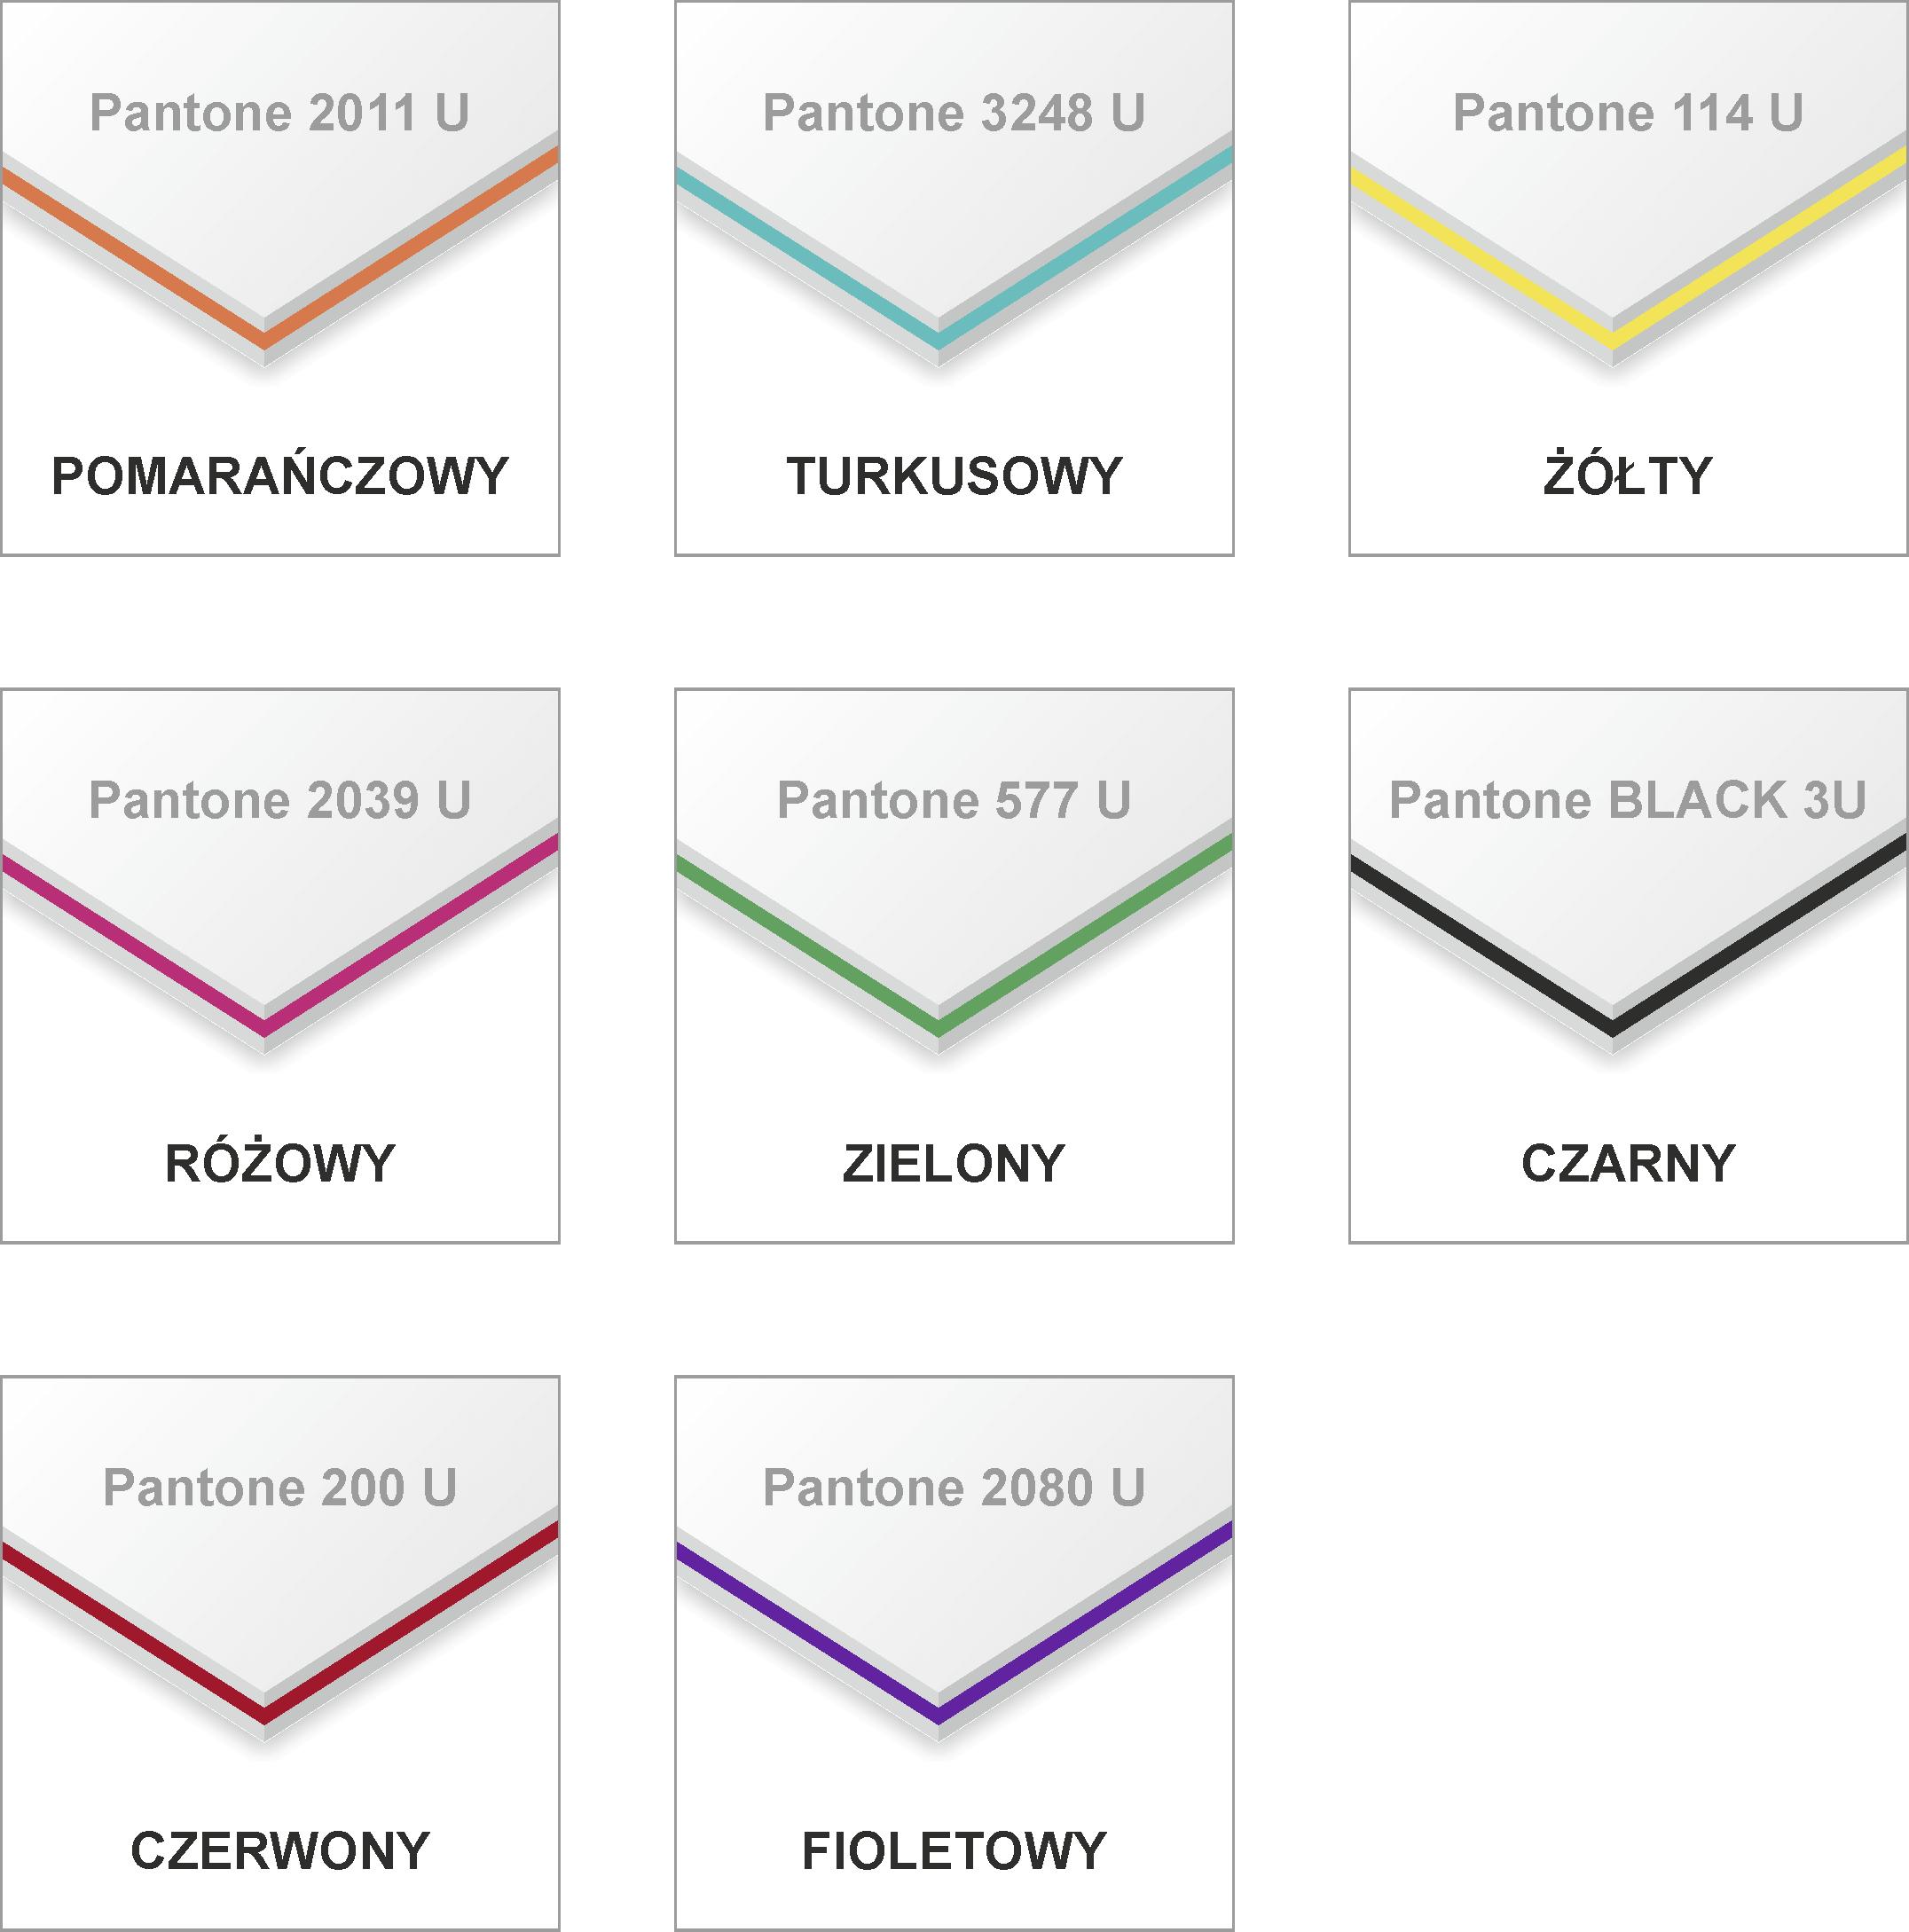 wizytowki-multiloft-ikony-pantone